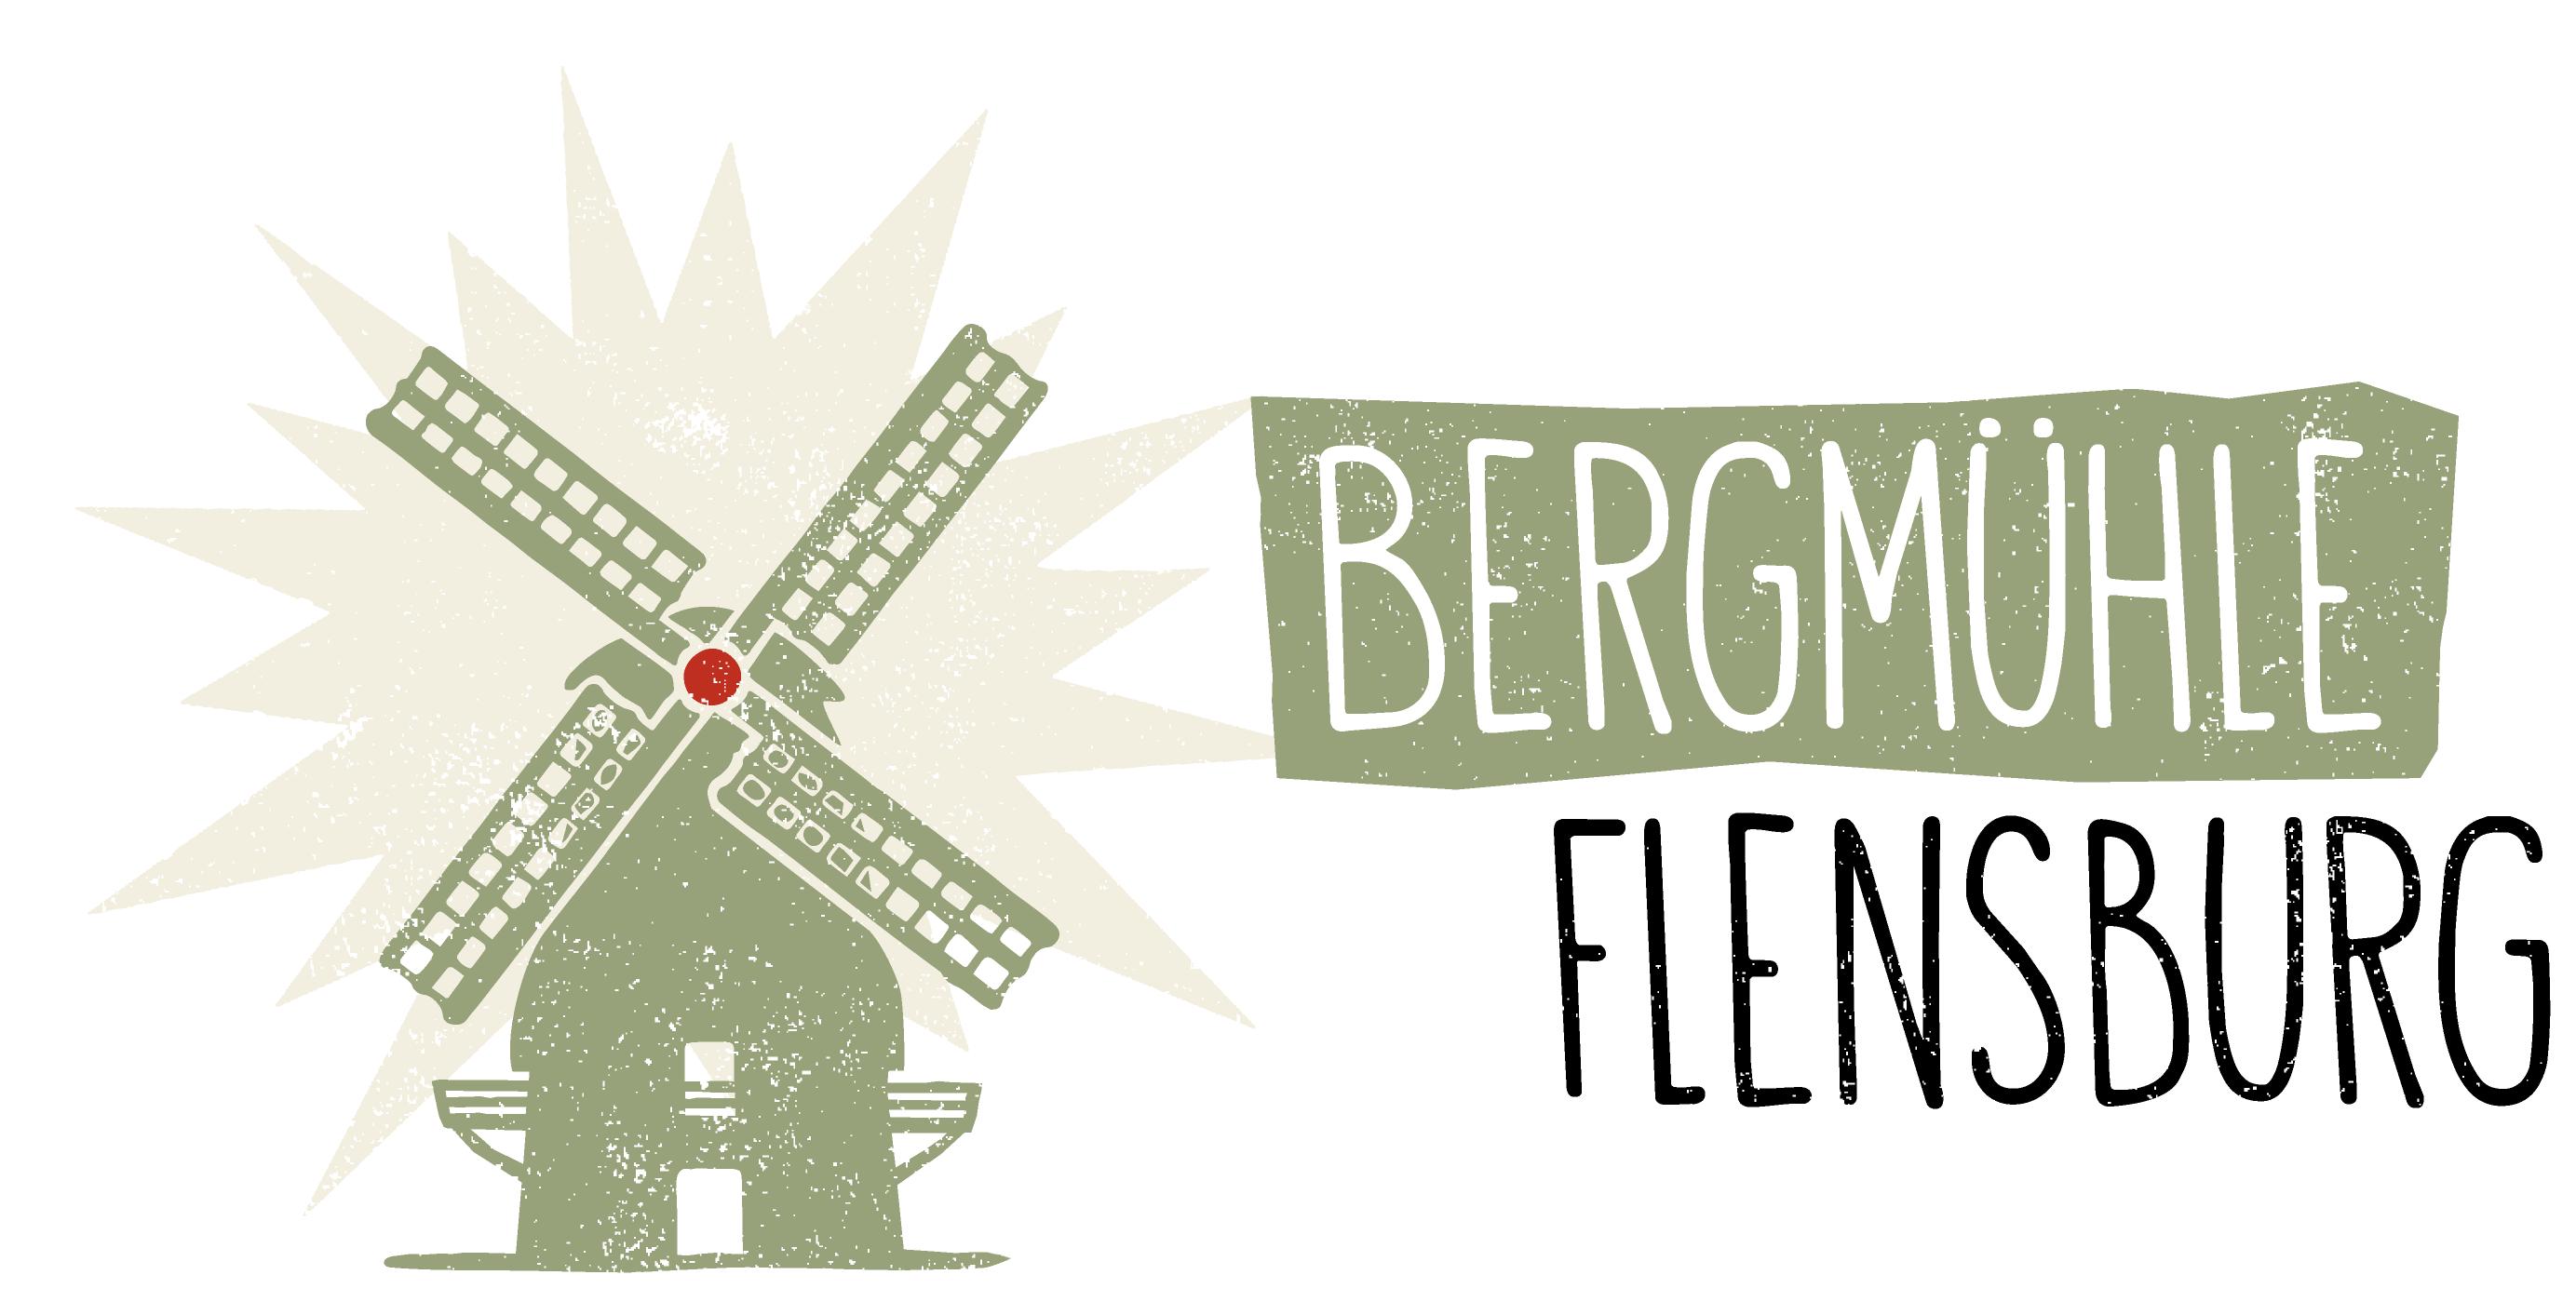 Bergmühle Flensburg